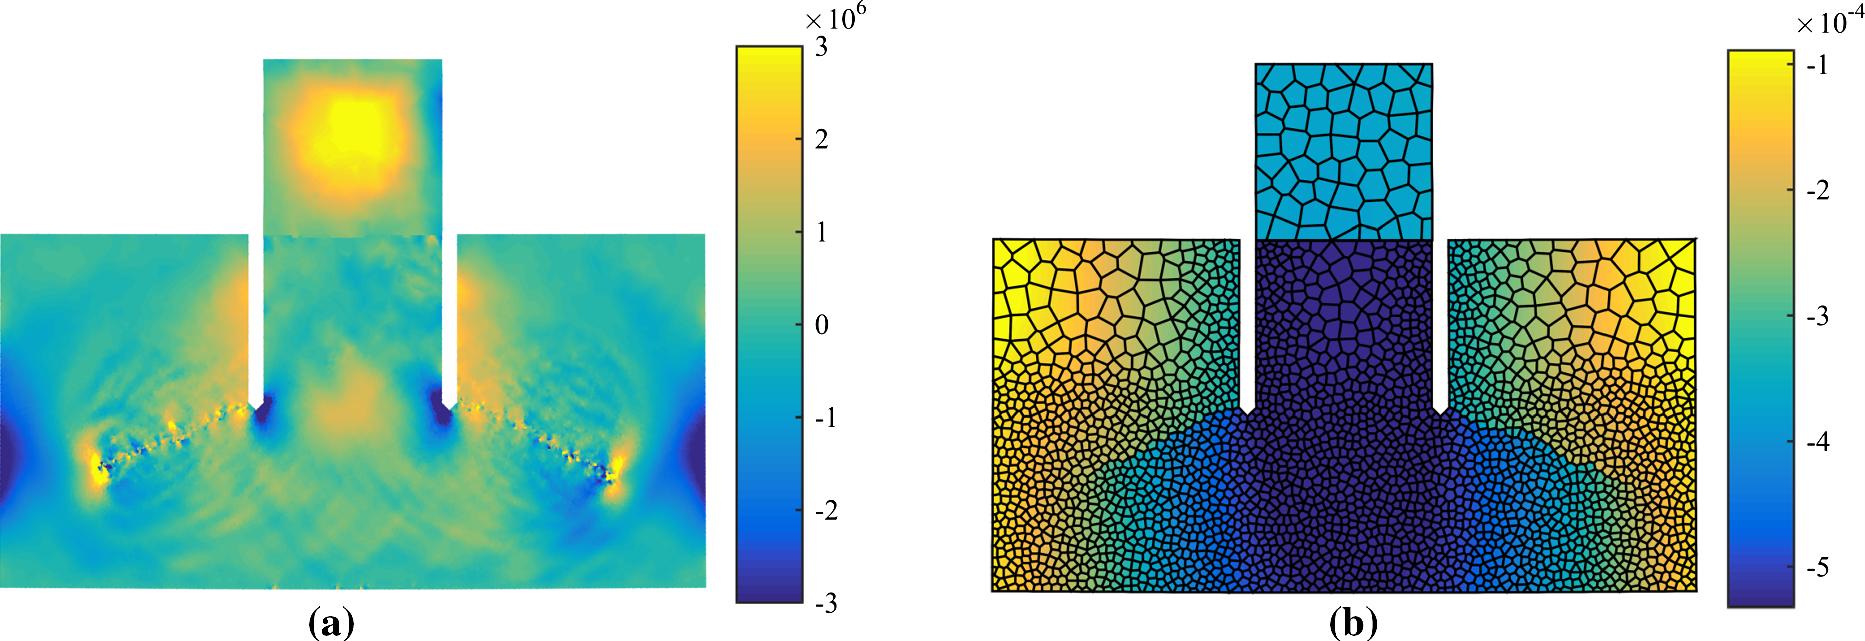 Finite deformation cohesive polygonal finite elements for modeling